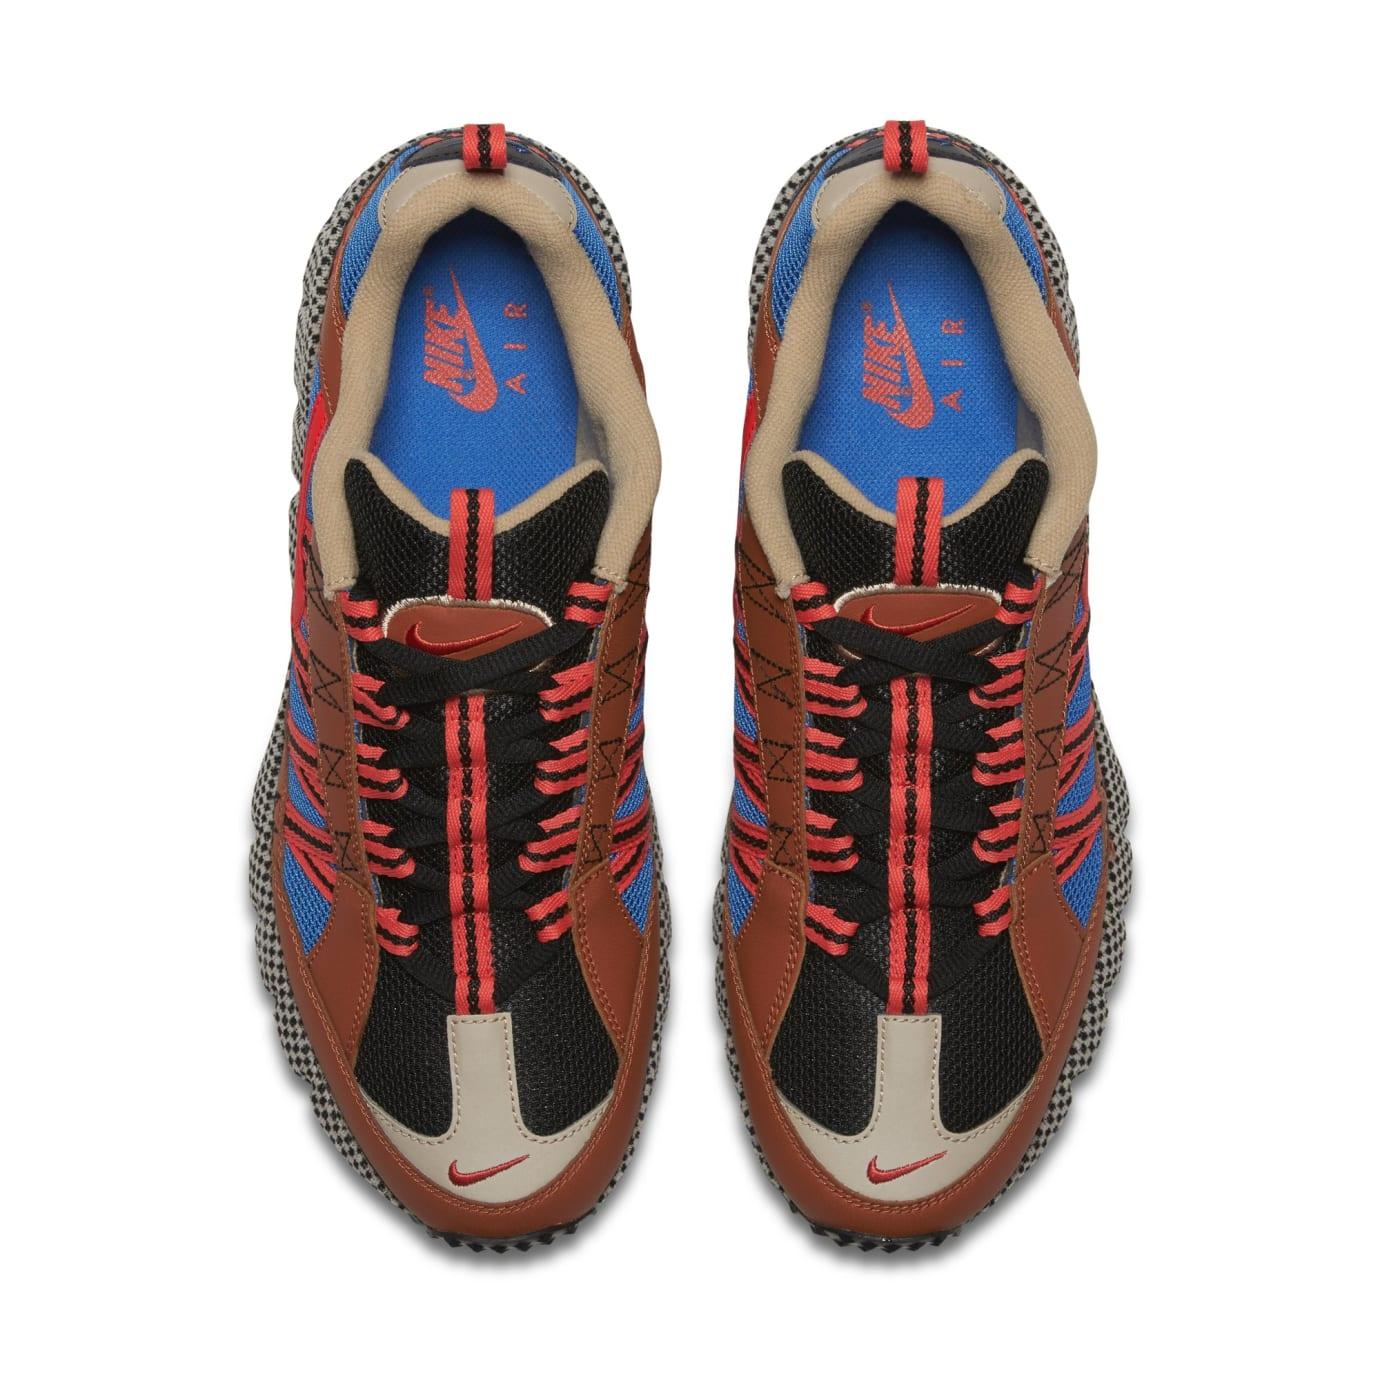 Nike Air Humara 'Dark Russet' AO3297-200 (Top)